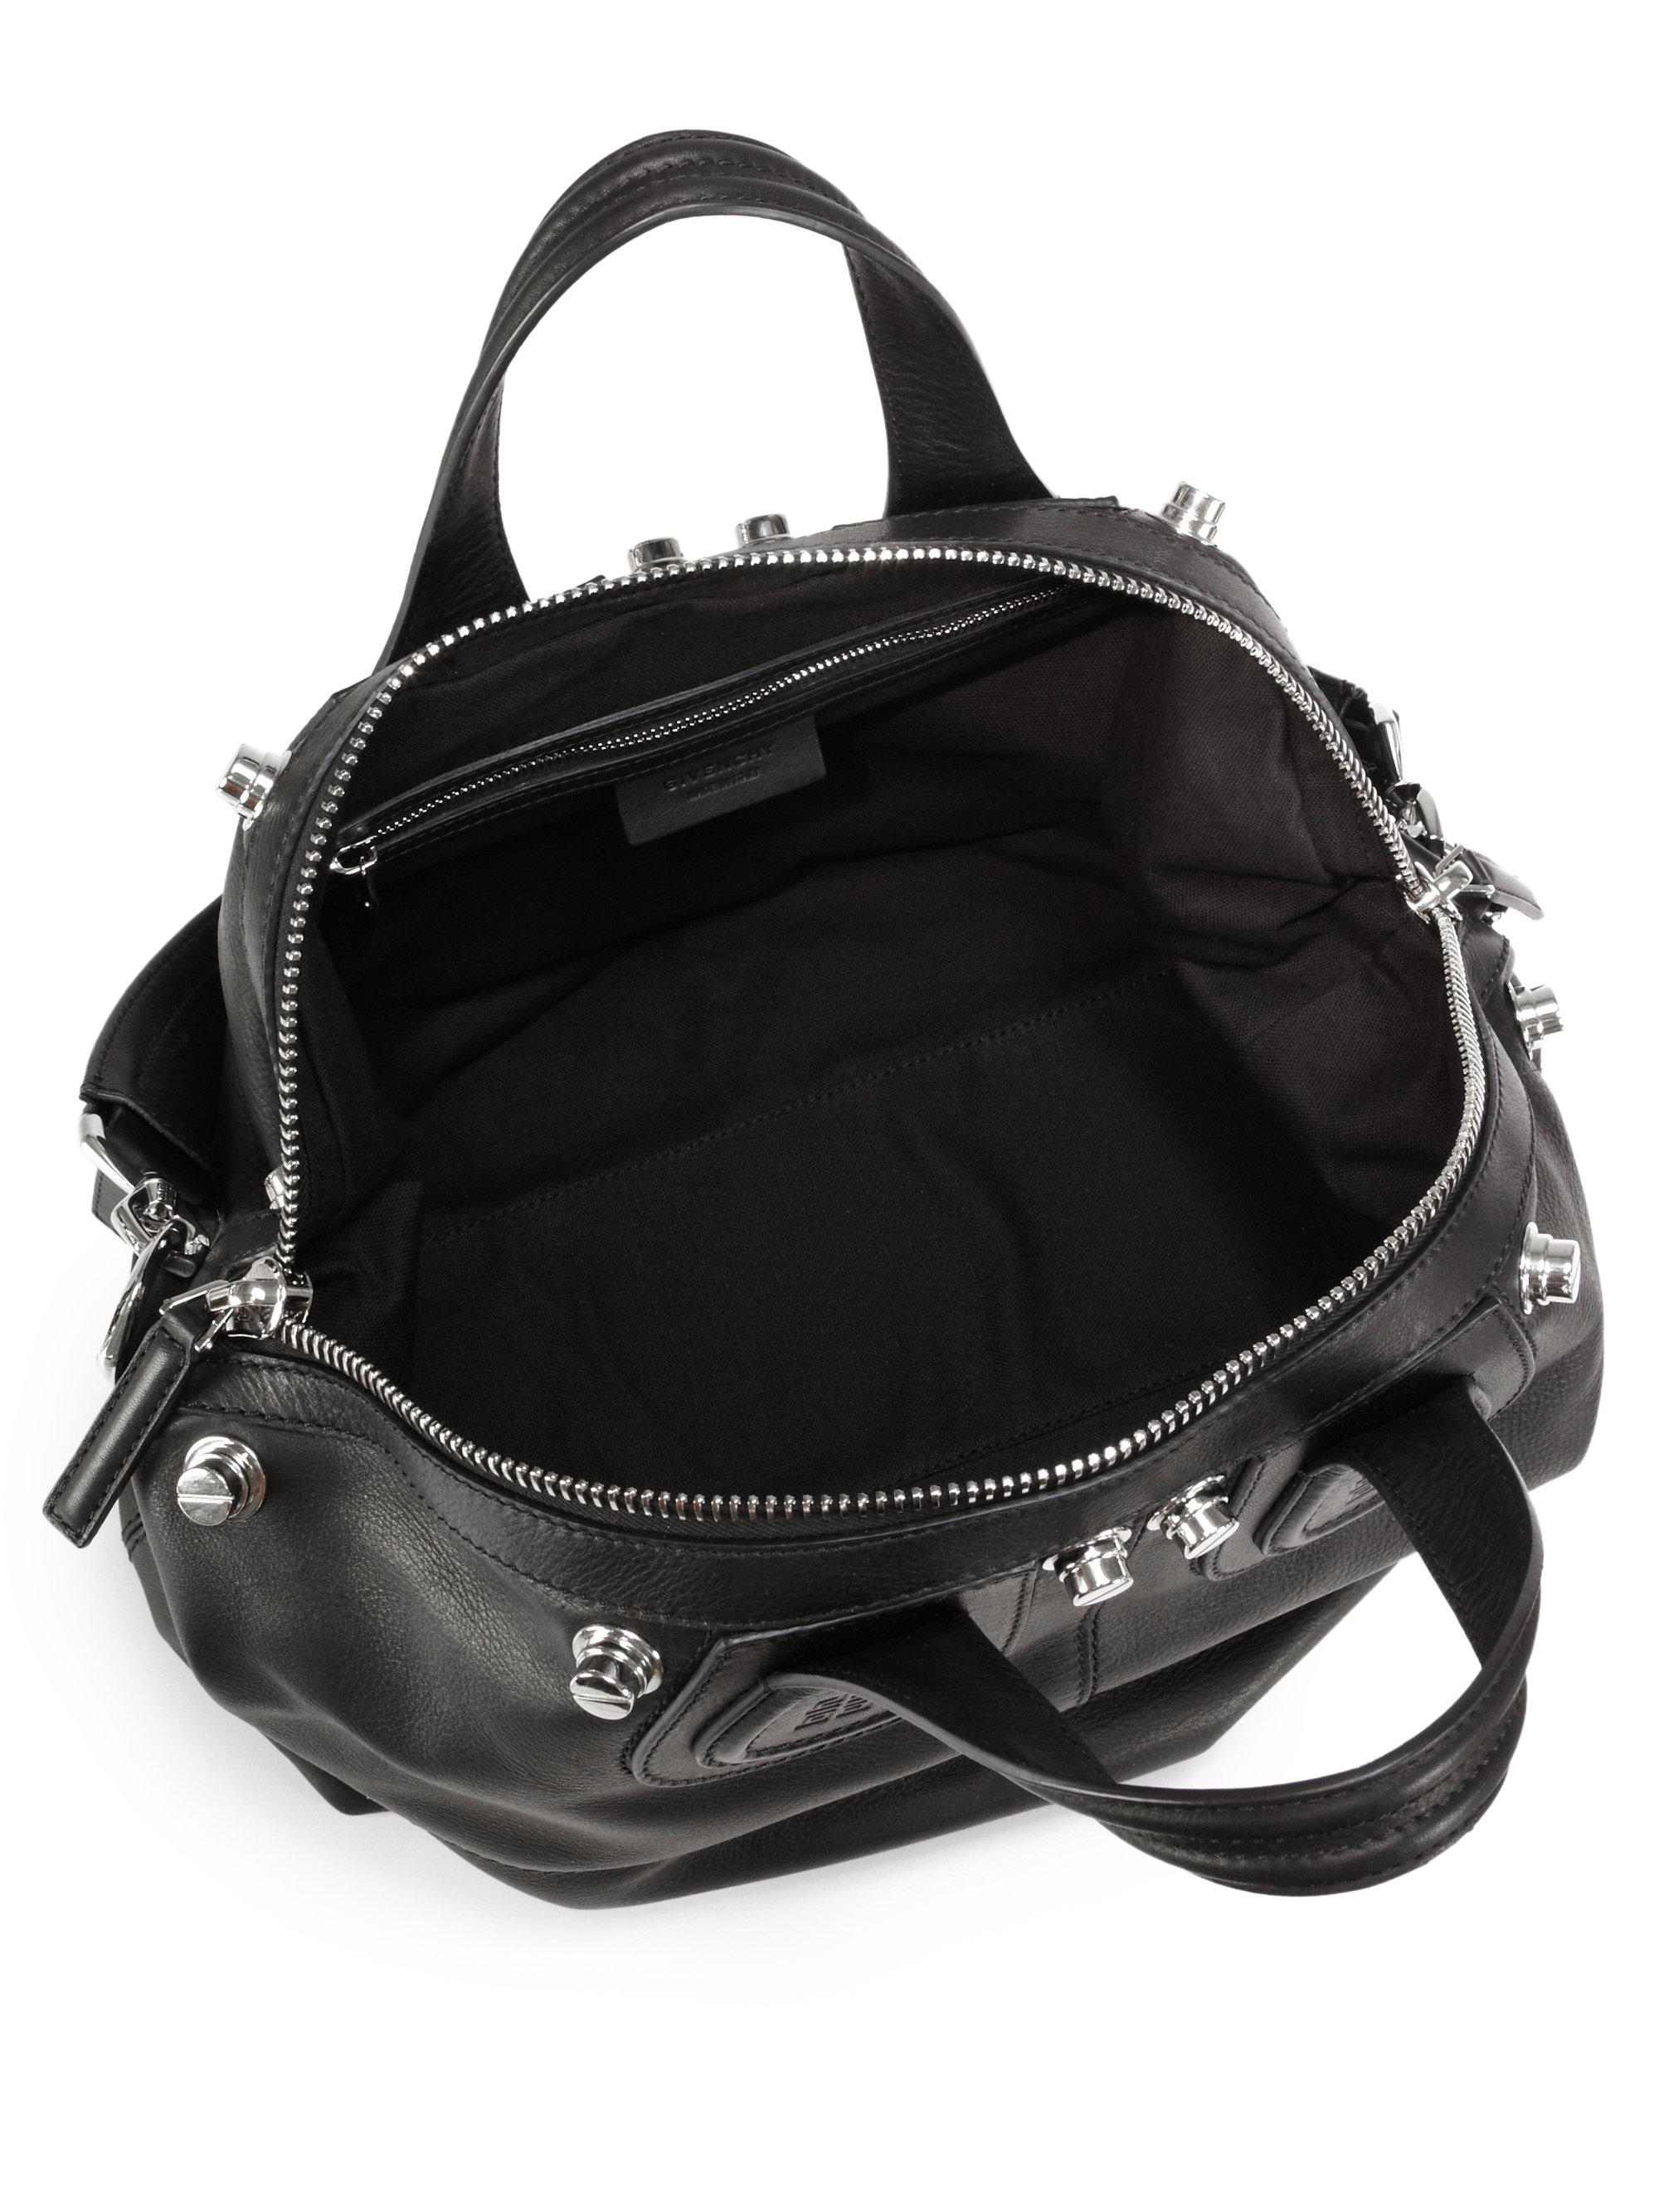 a565eb37581f Lyst - Givenchy Nightingale Studded Medium Satchel in Black